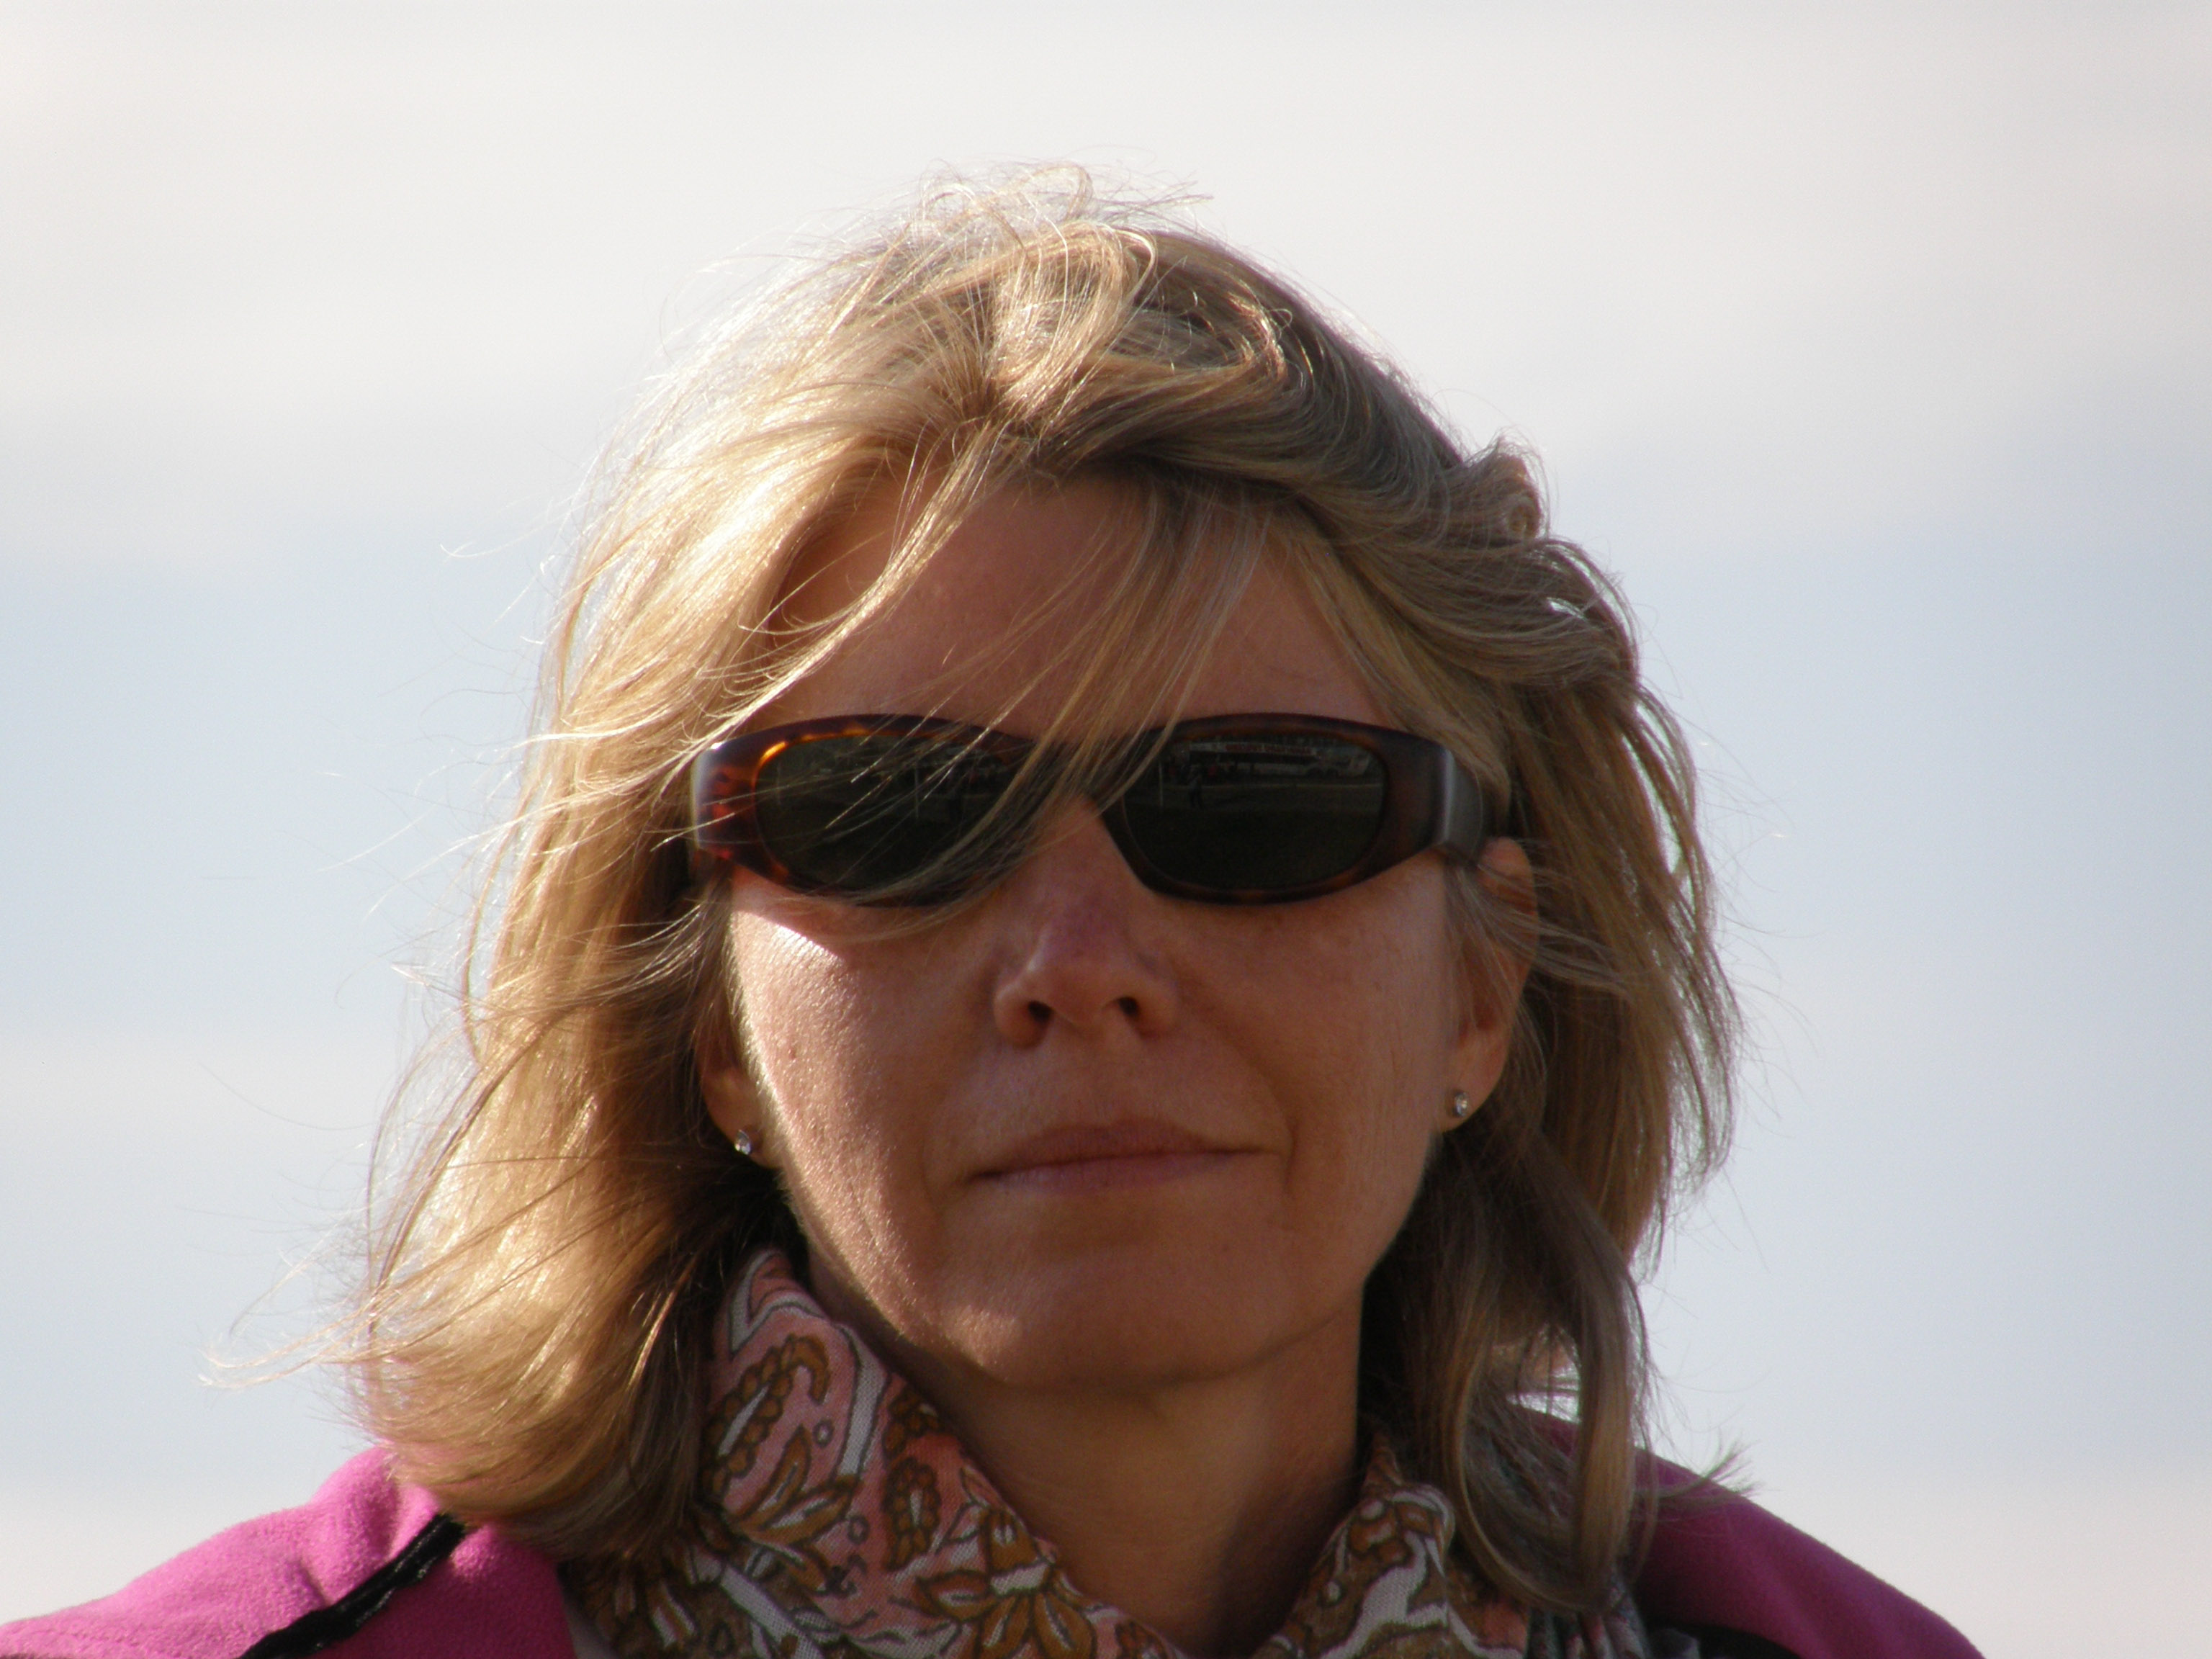 Zuzana Patkova